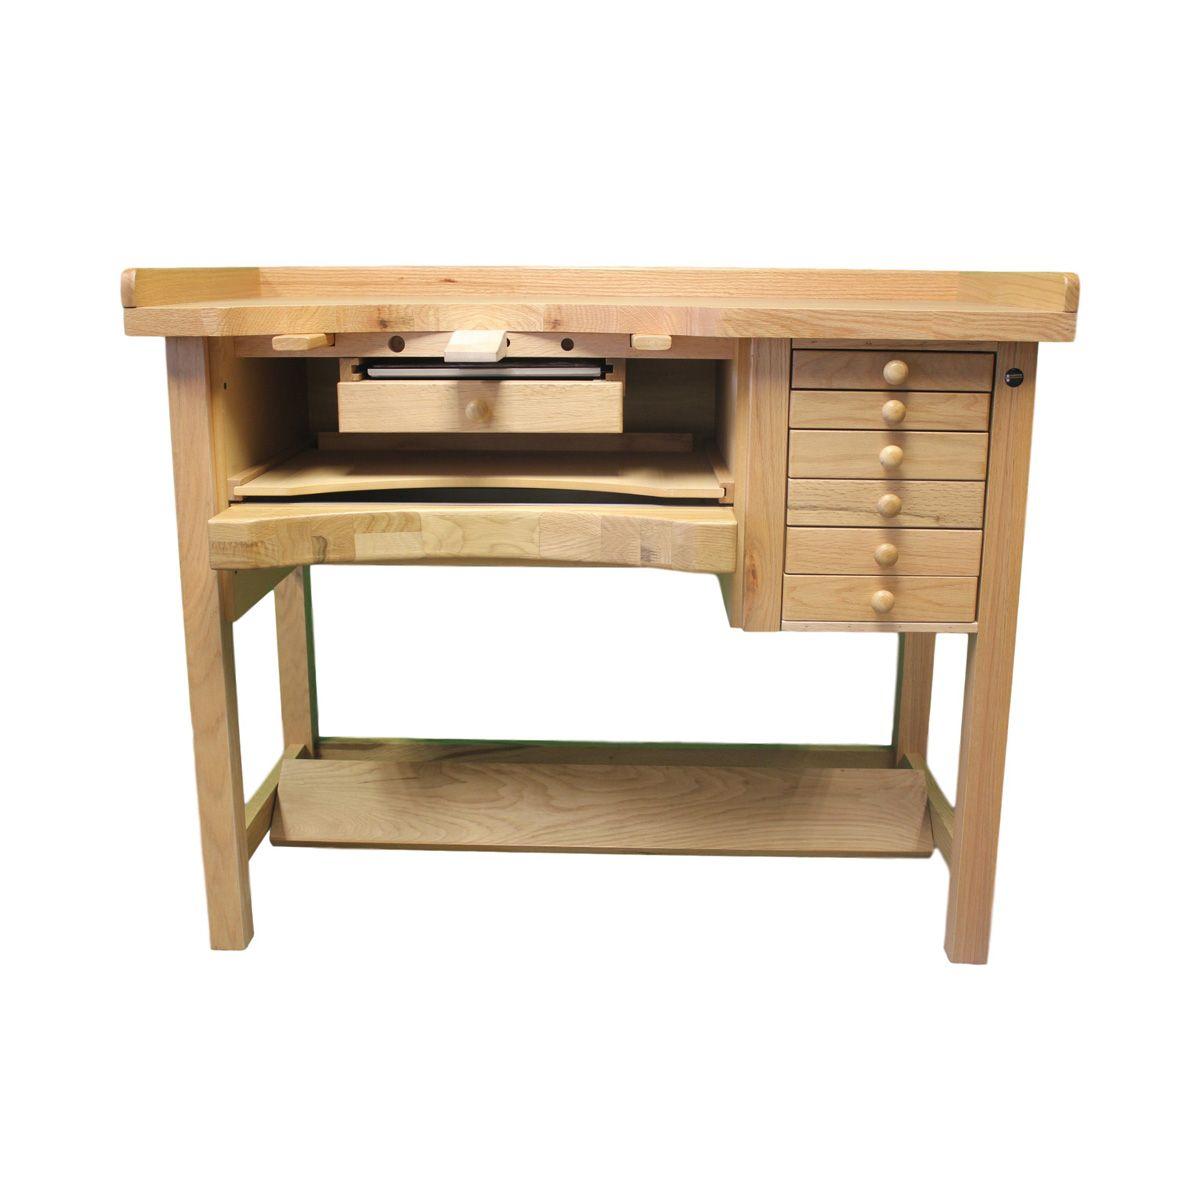 Outstanding Durston Superior Large Jewellers Workbench Dream Studio Cjindustries Chair Design For Home Cjindustriesco